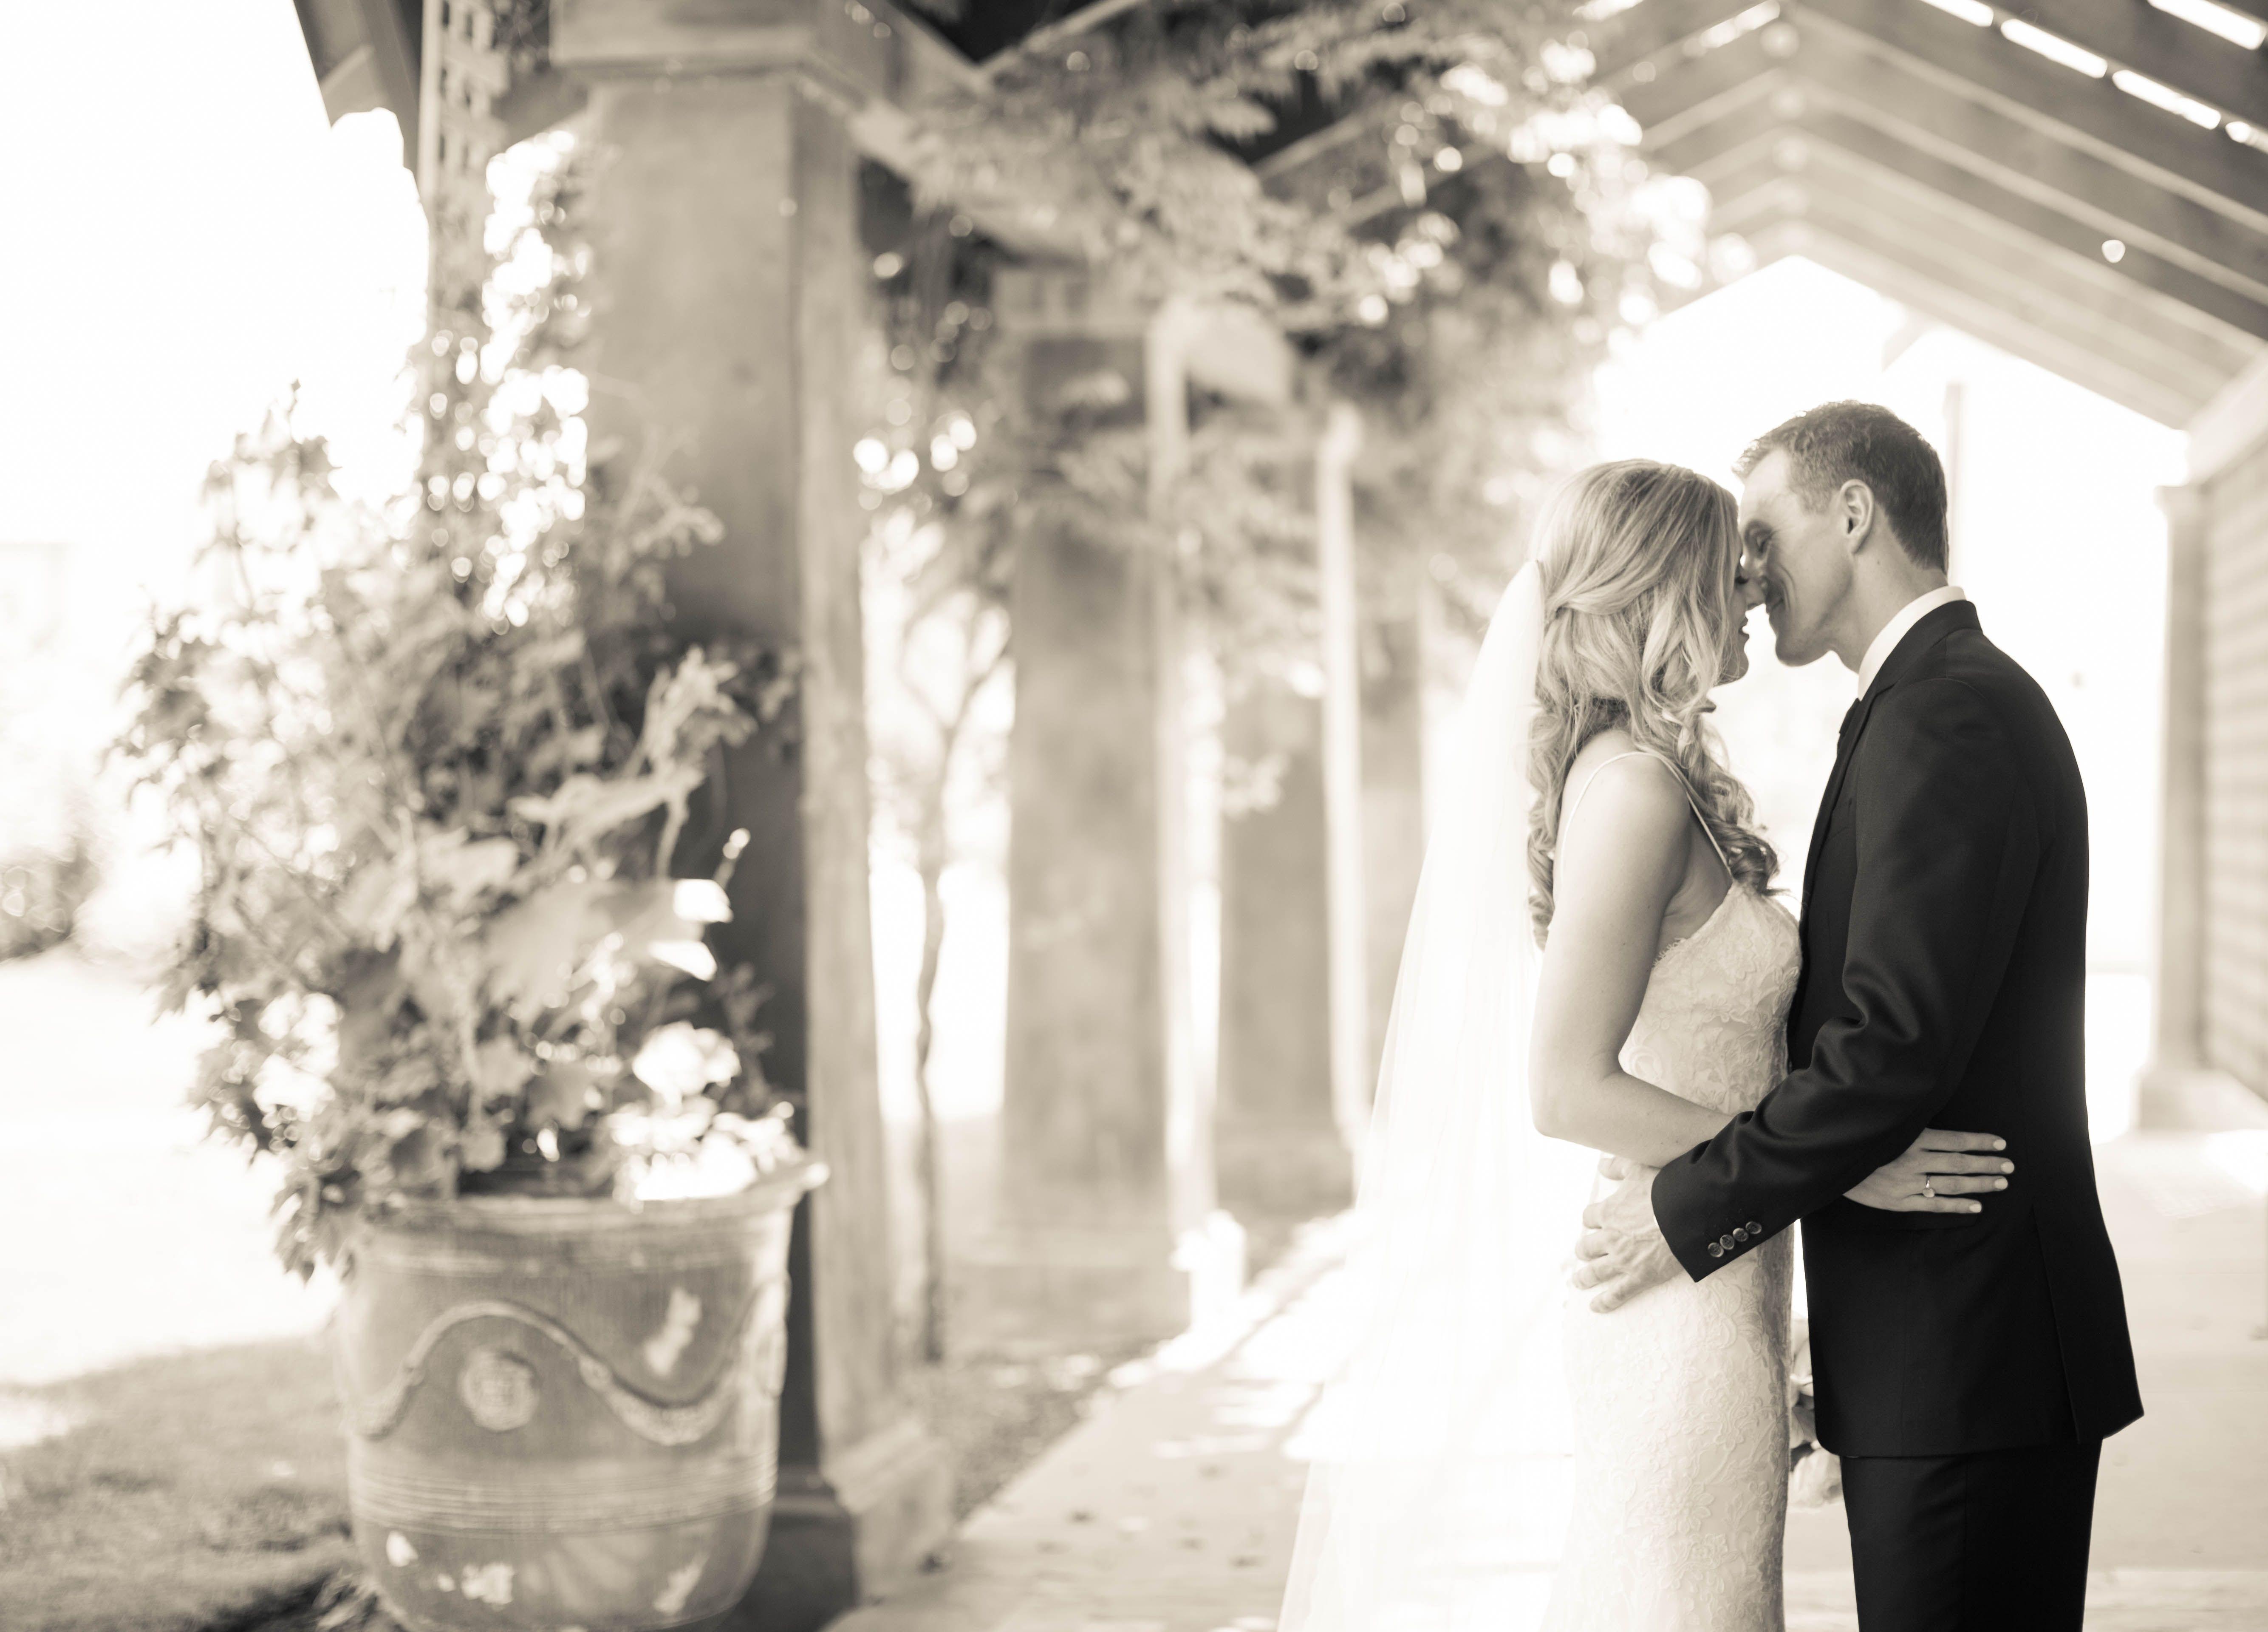 Alex And Neals Walla Wedding Photography At Abeja By Gigi Hickman